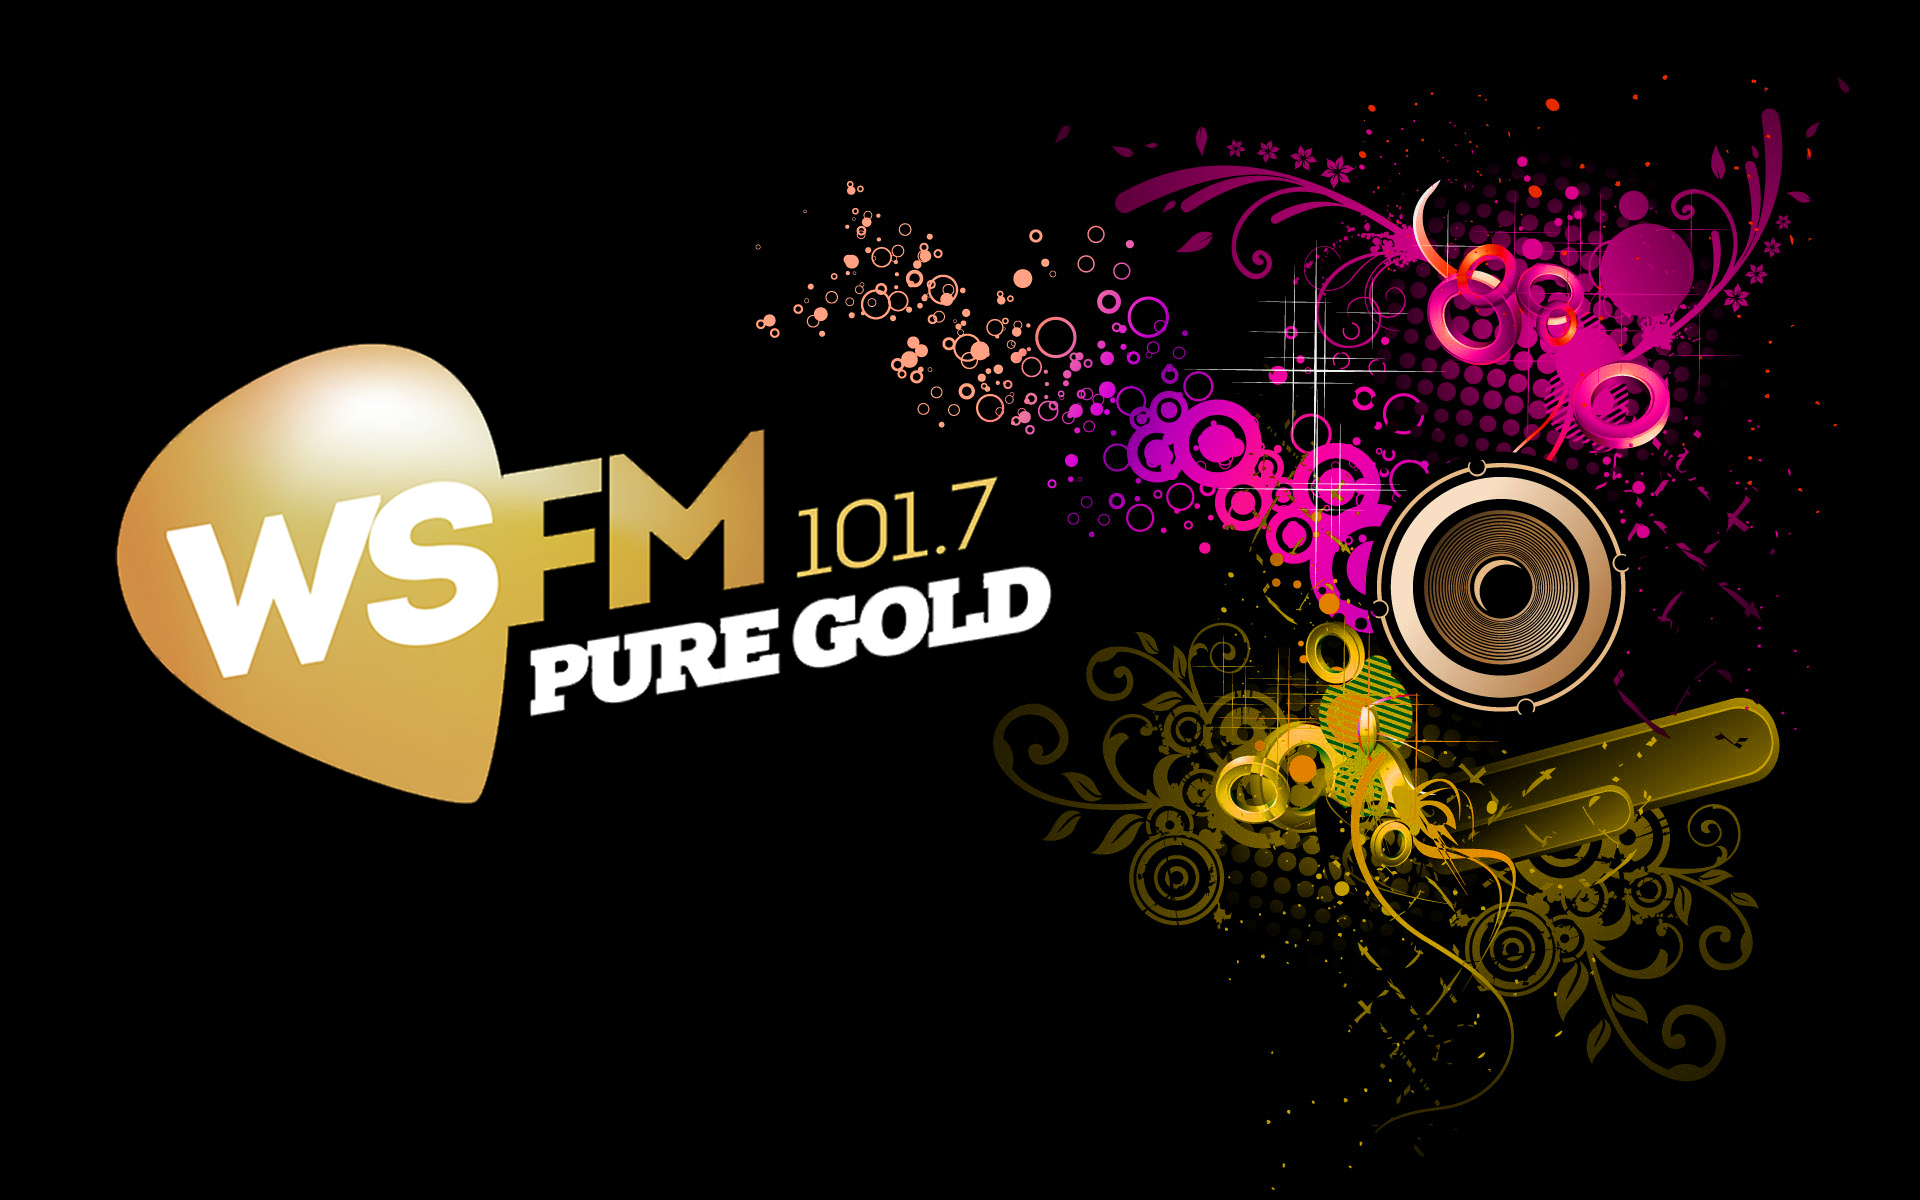 101.7 WS FM